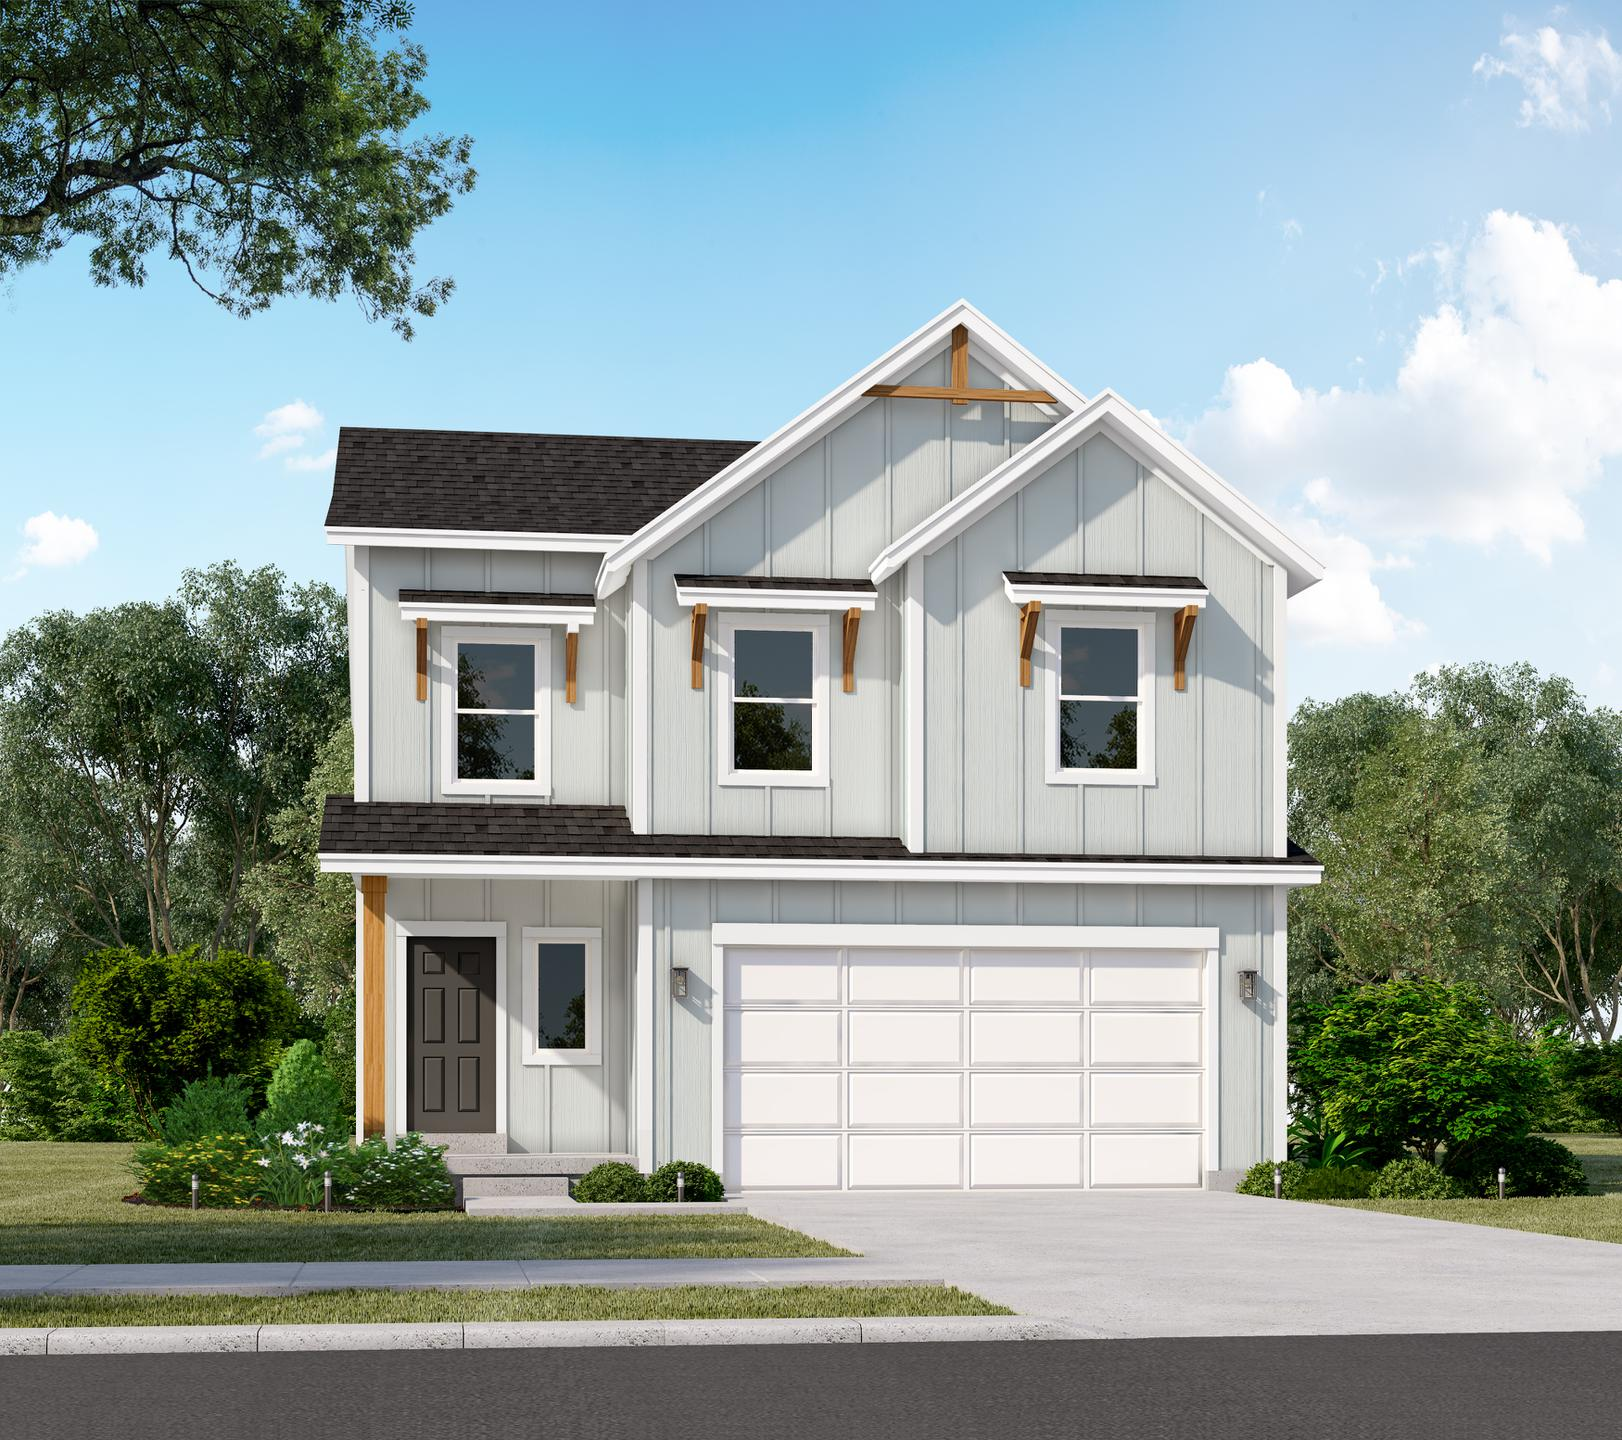 The Ashwood new home floorplan in Utah